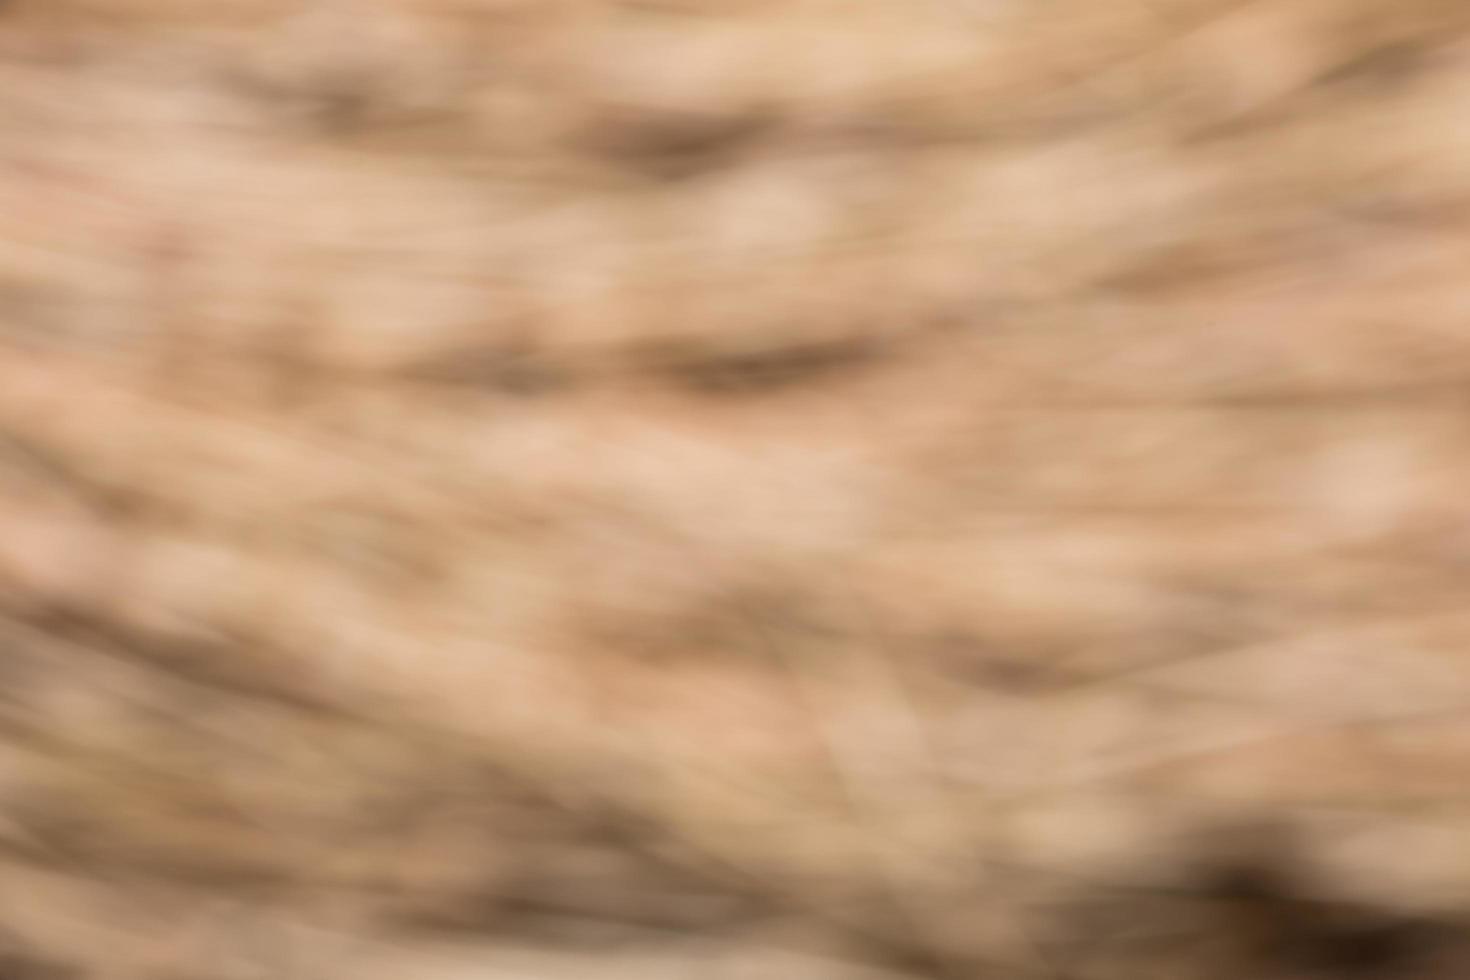 suddig brun bakgrund foto